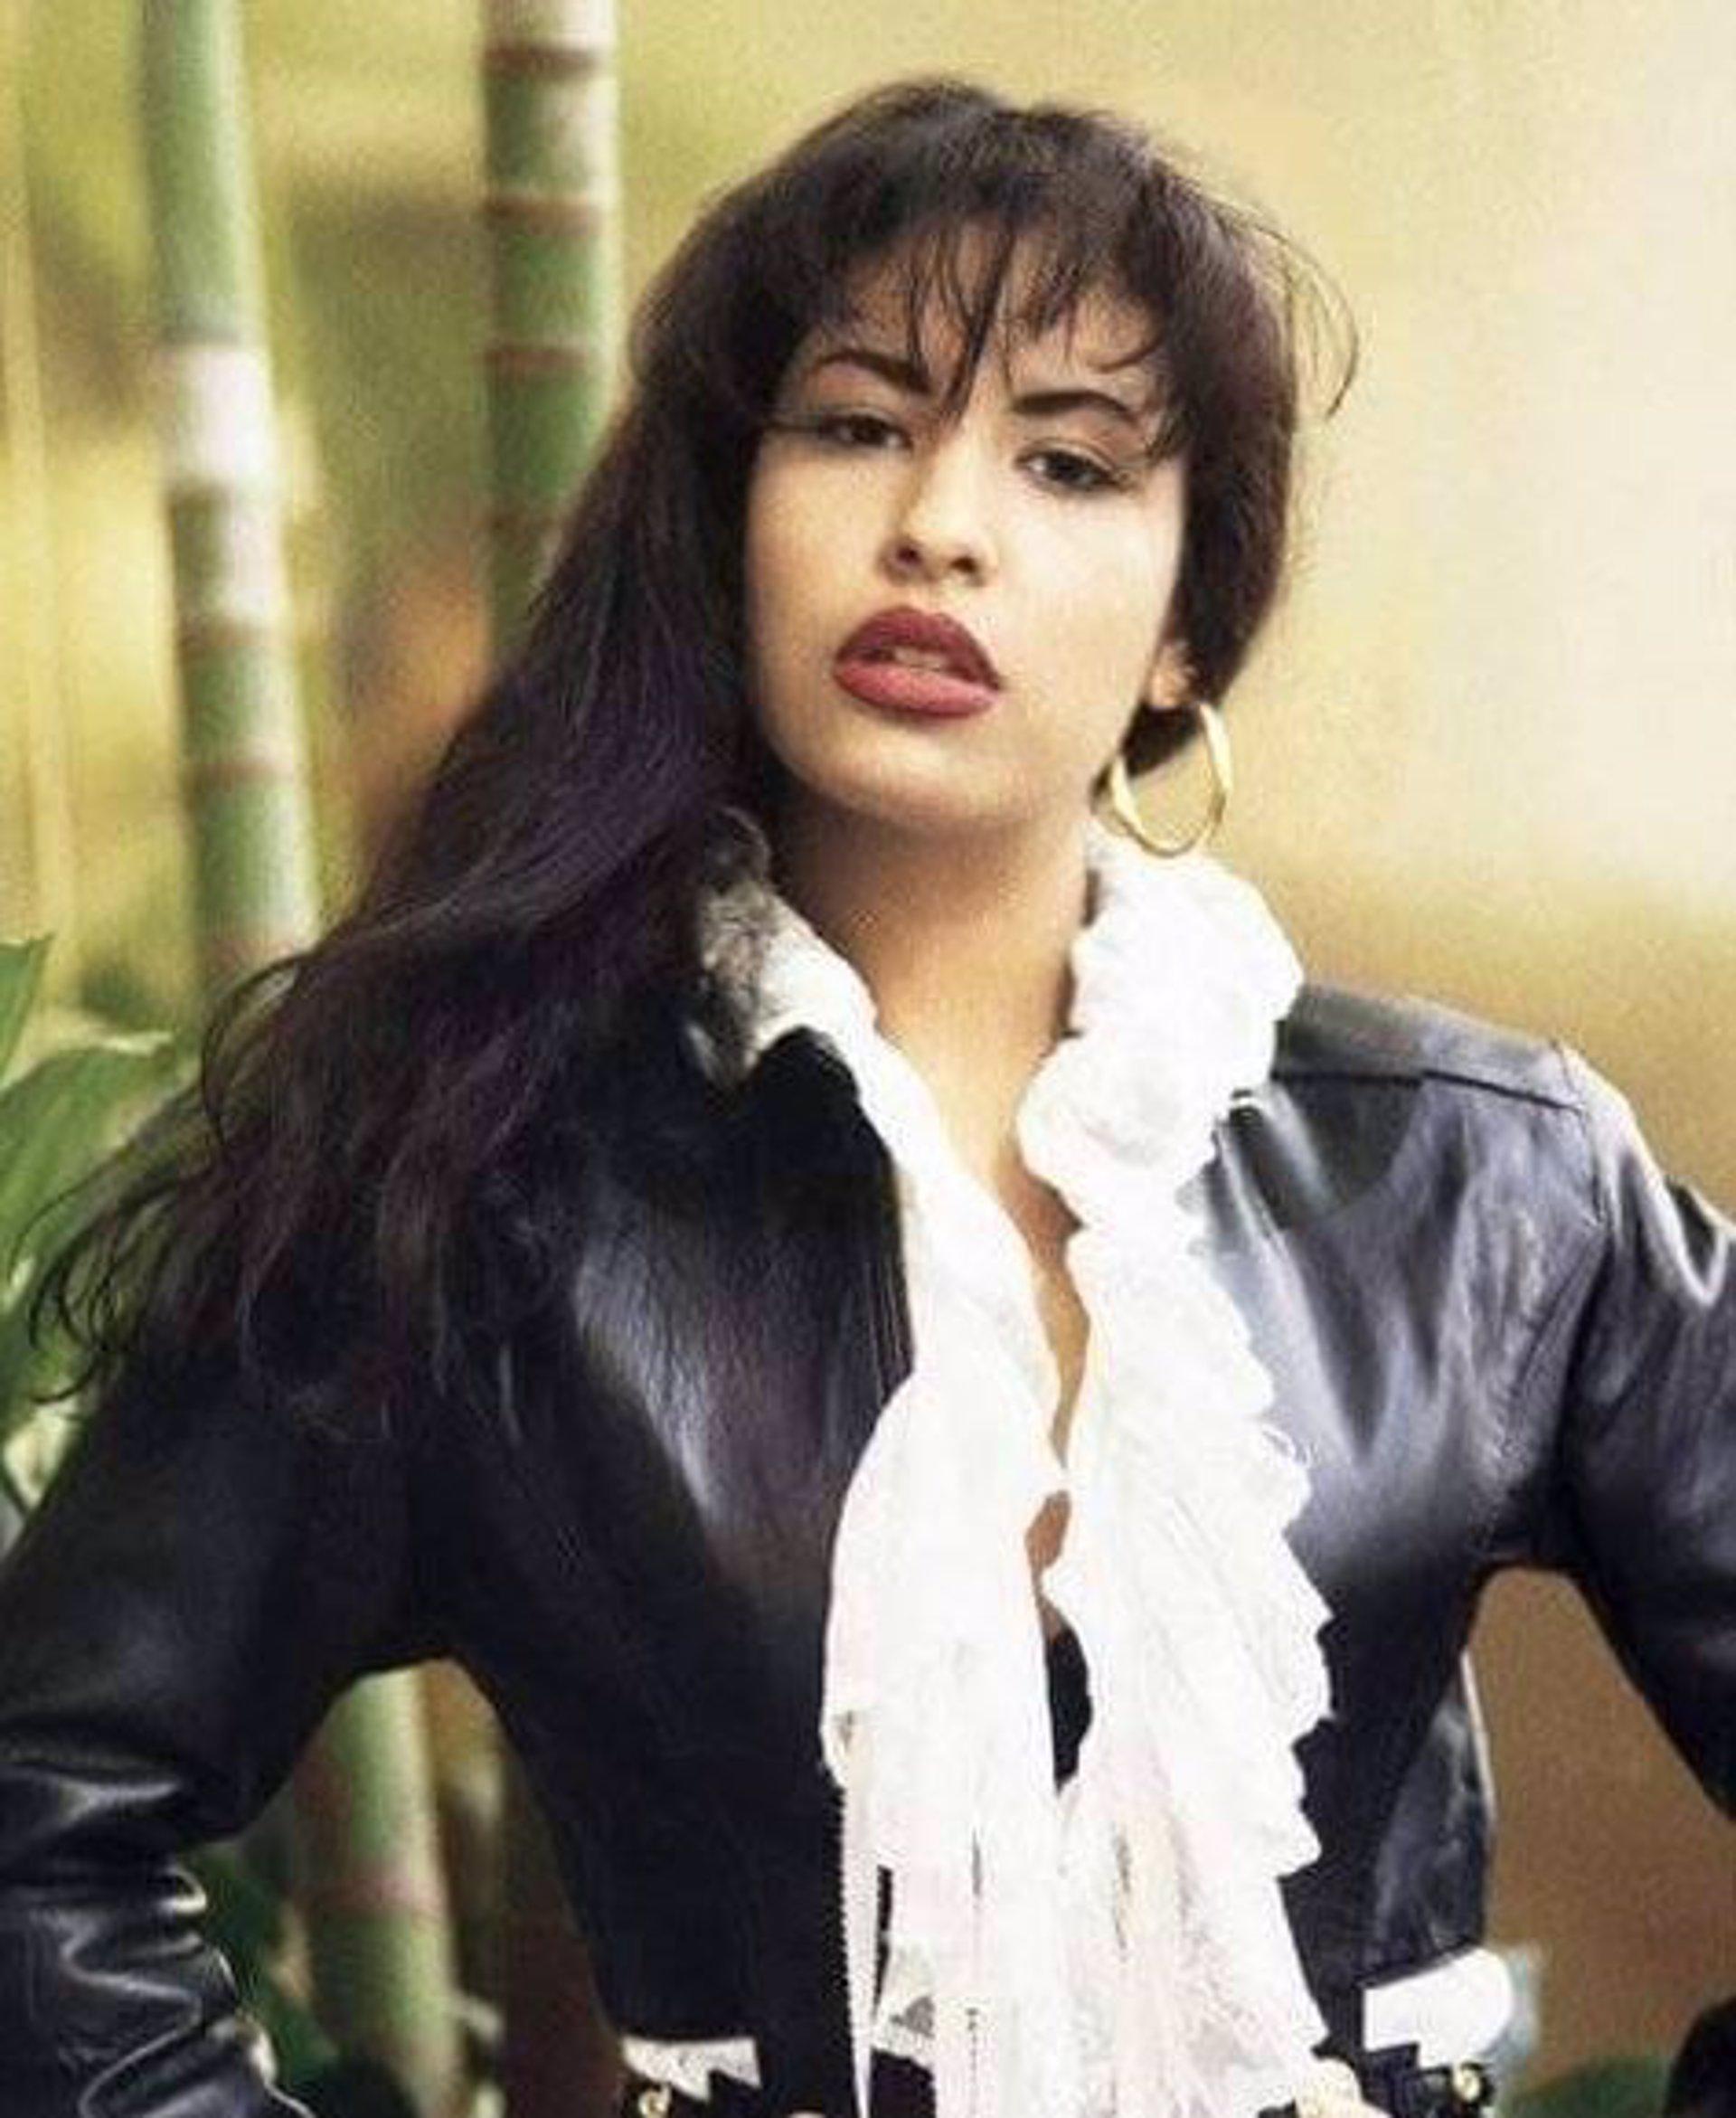 Fotonoticia Selena Amor Prohibido Photos Of